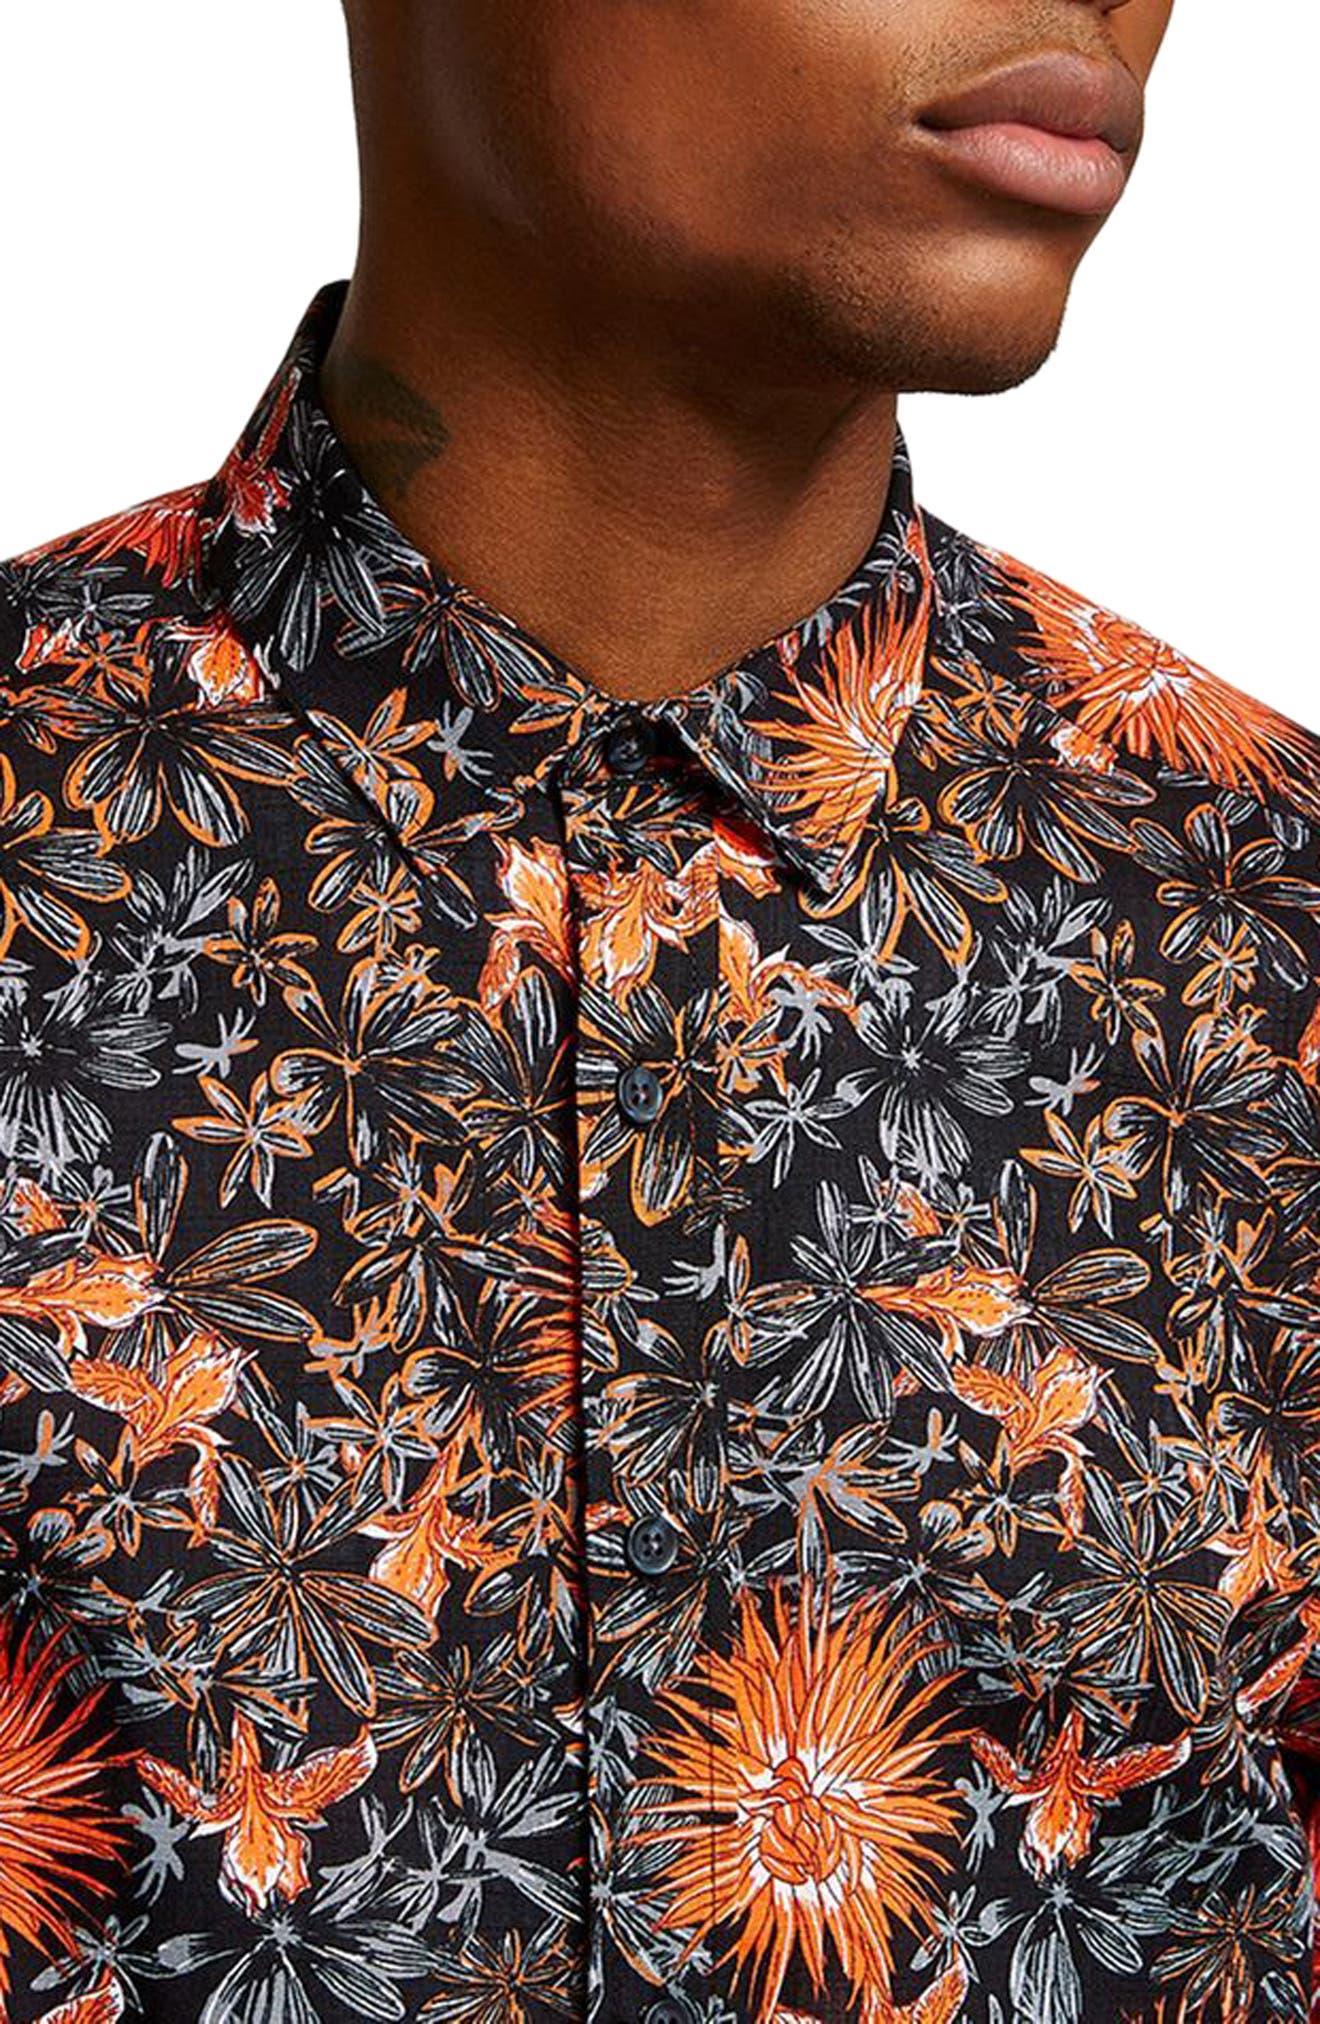 Floral Print Shirt,                             Alternate thumbnail 3, color,                             800